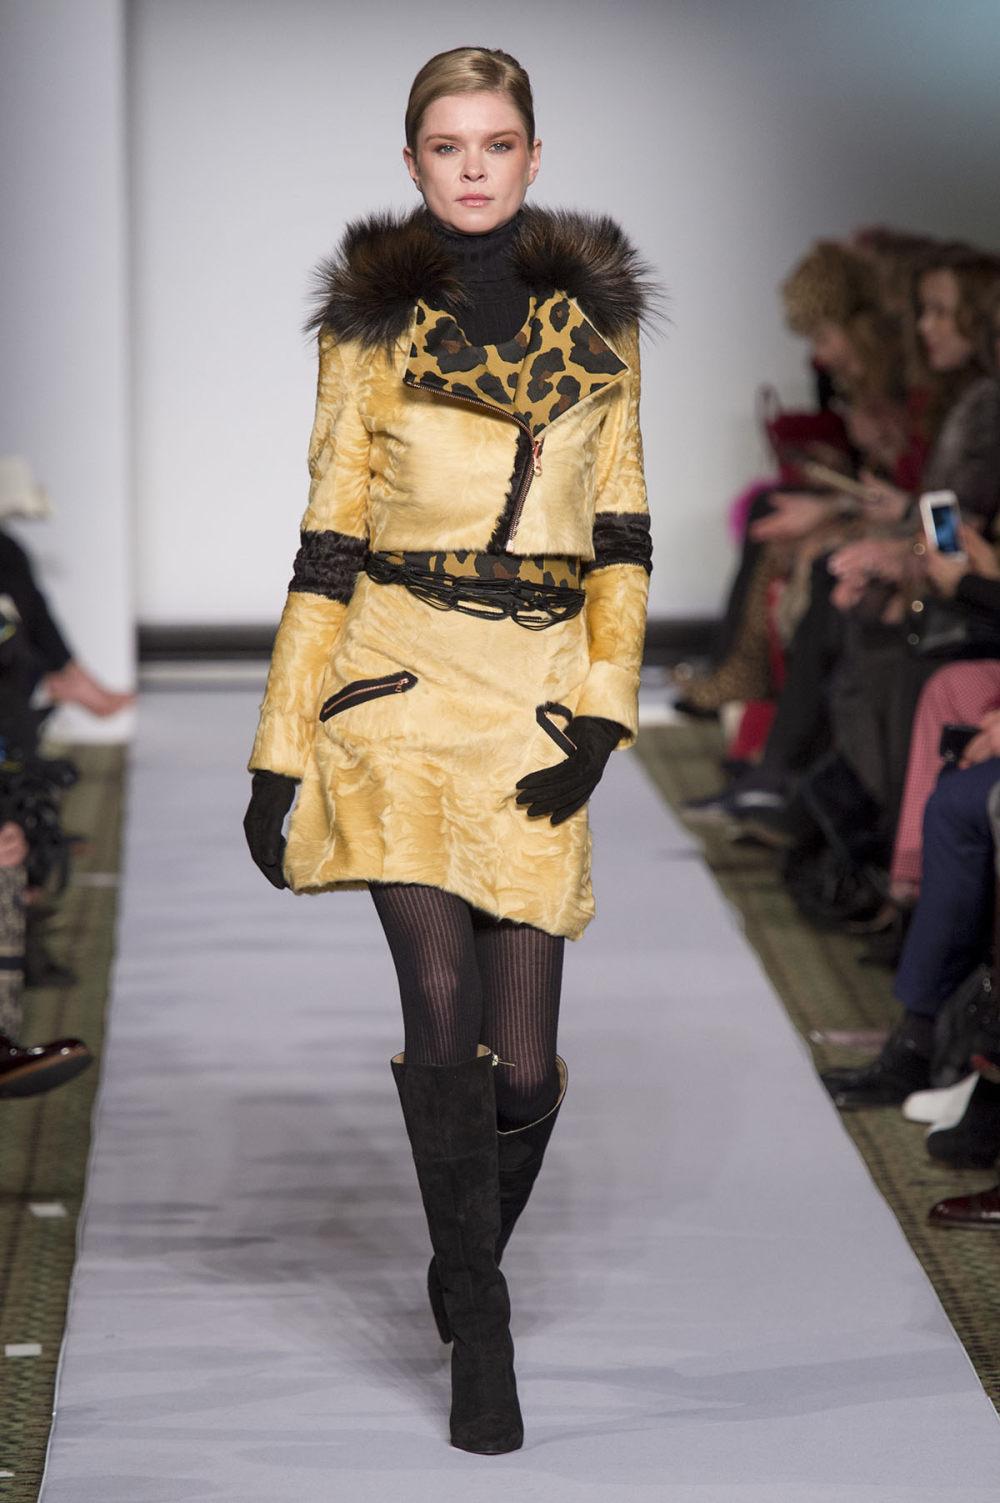 Carolina Herrera时装系列用鲜艳的颜色充满智能的黑白色调-2.jpg